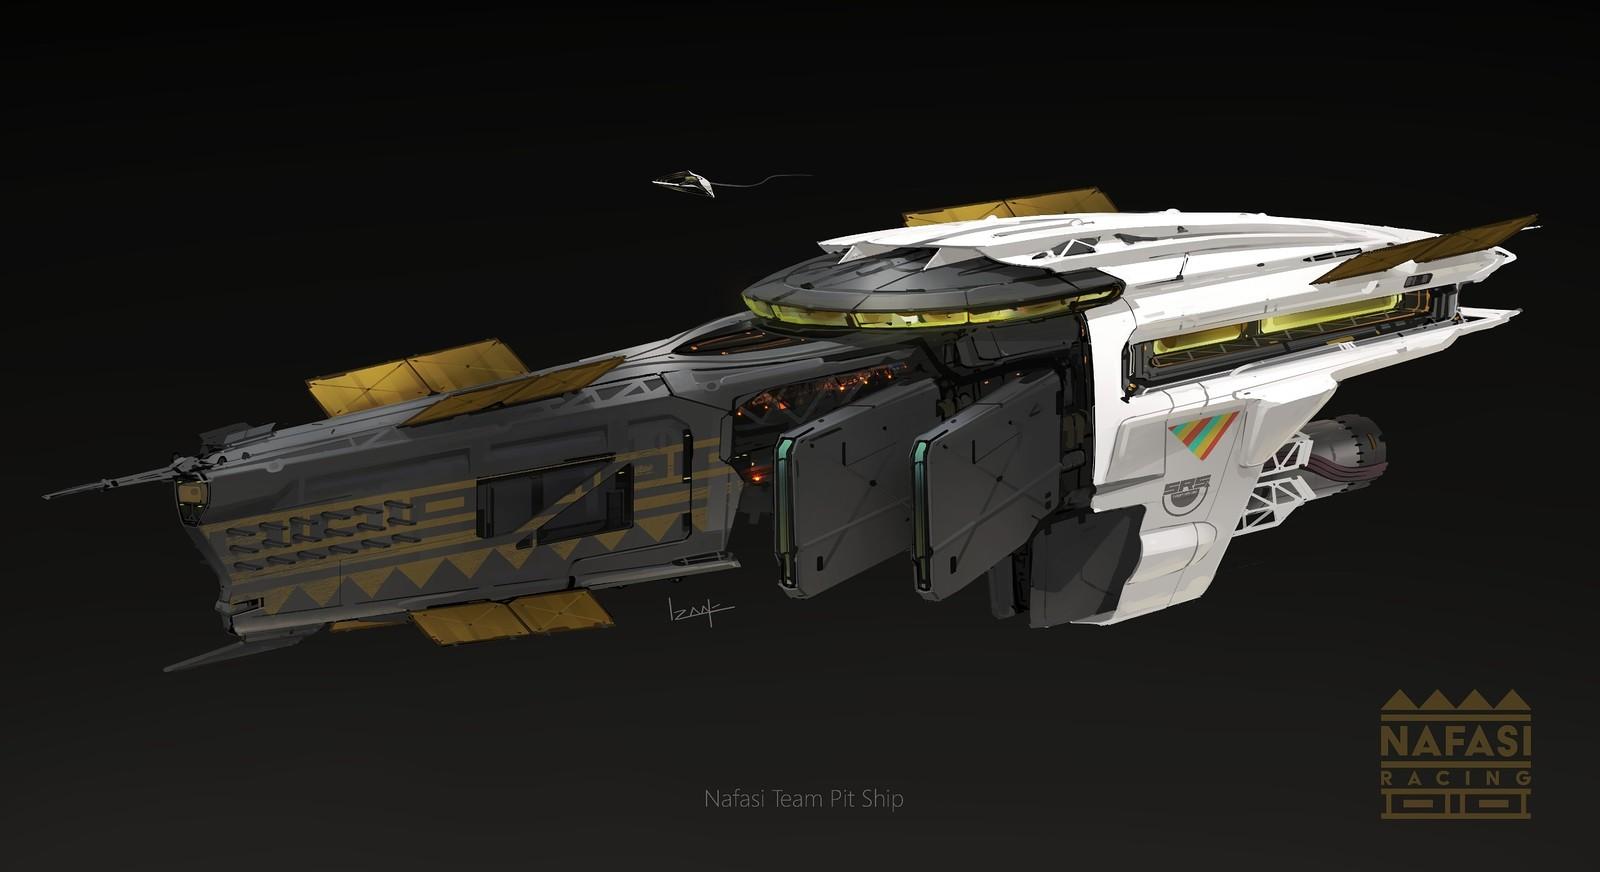 Team Nafasi Pit Ship